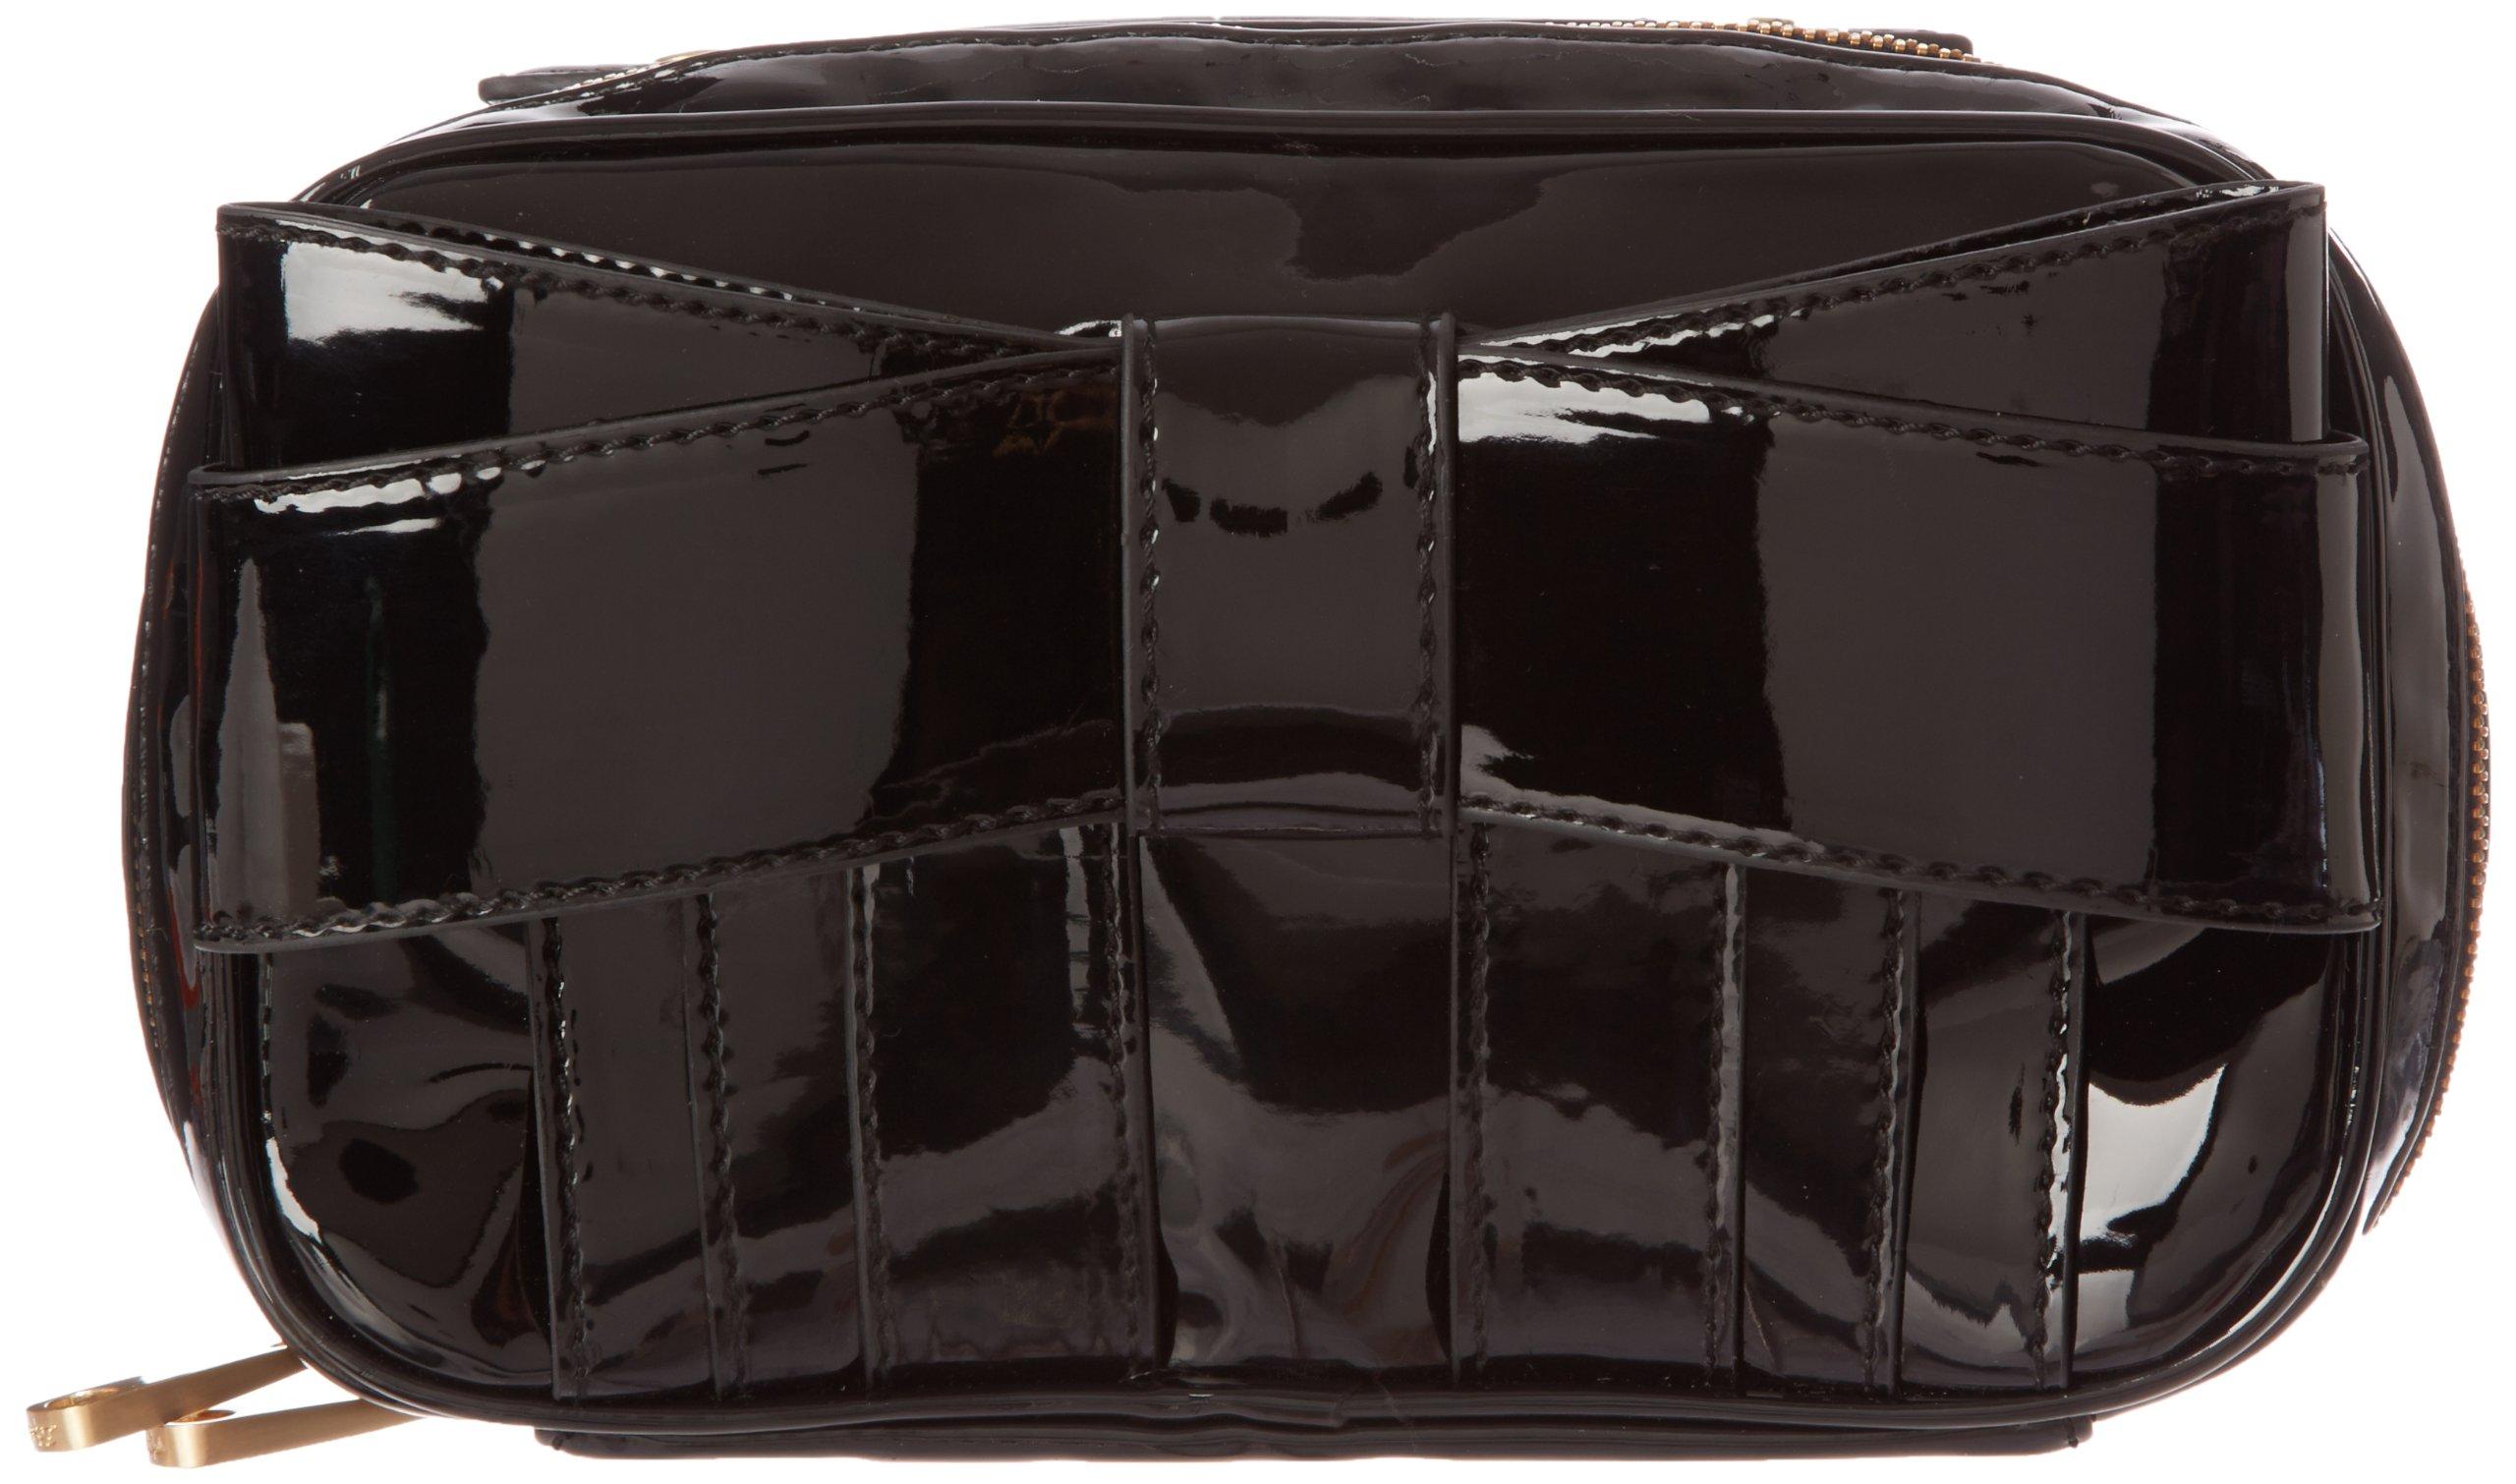 Z Spoke Zac Posen Shirley ZS1346 Cosmetic Case,Black Patent,One Size by ZAC Zac Posen